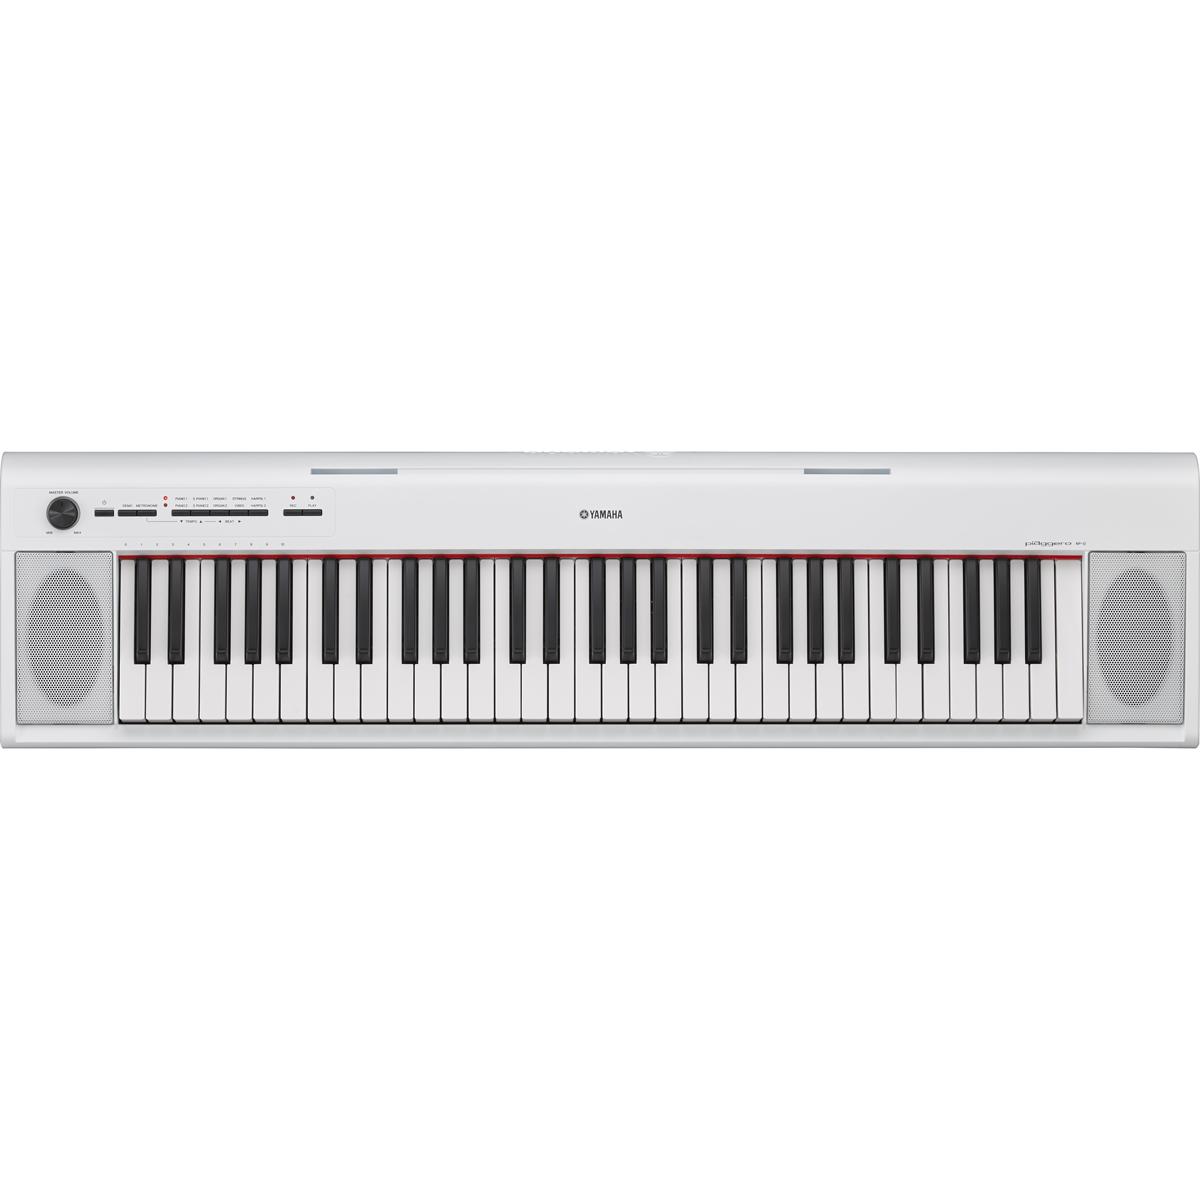 Billede af Yamaha NP-12WHPiaggero el-klaver hvid